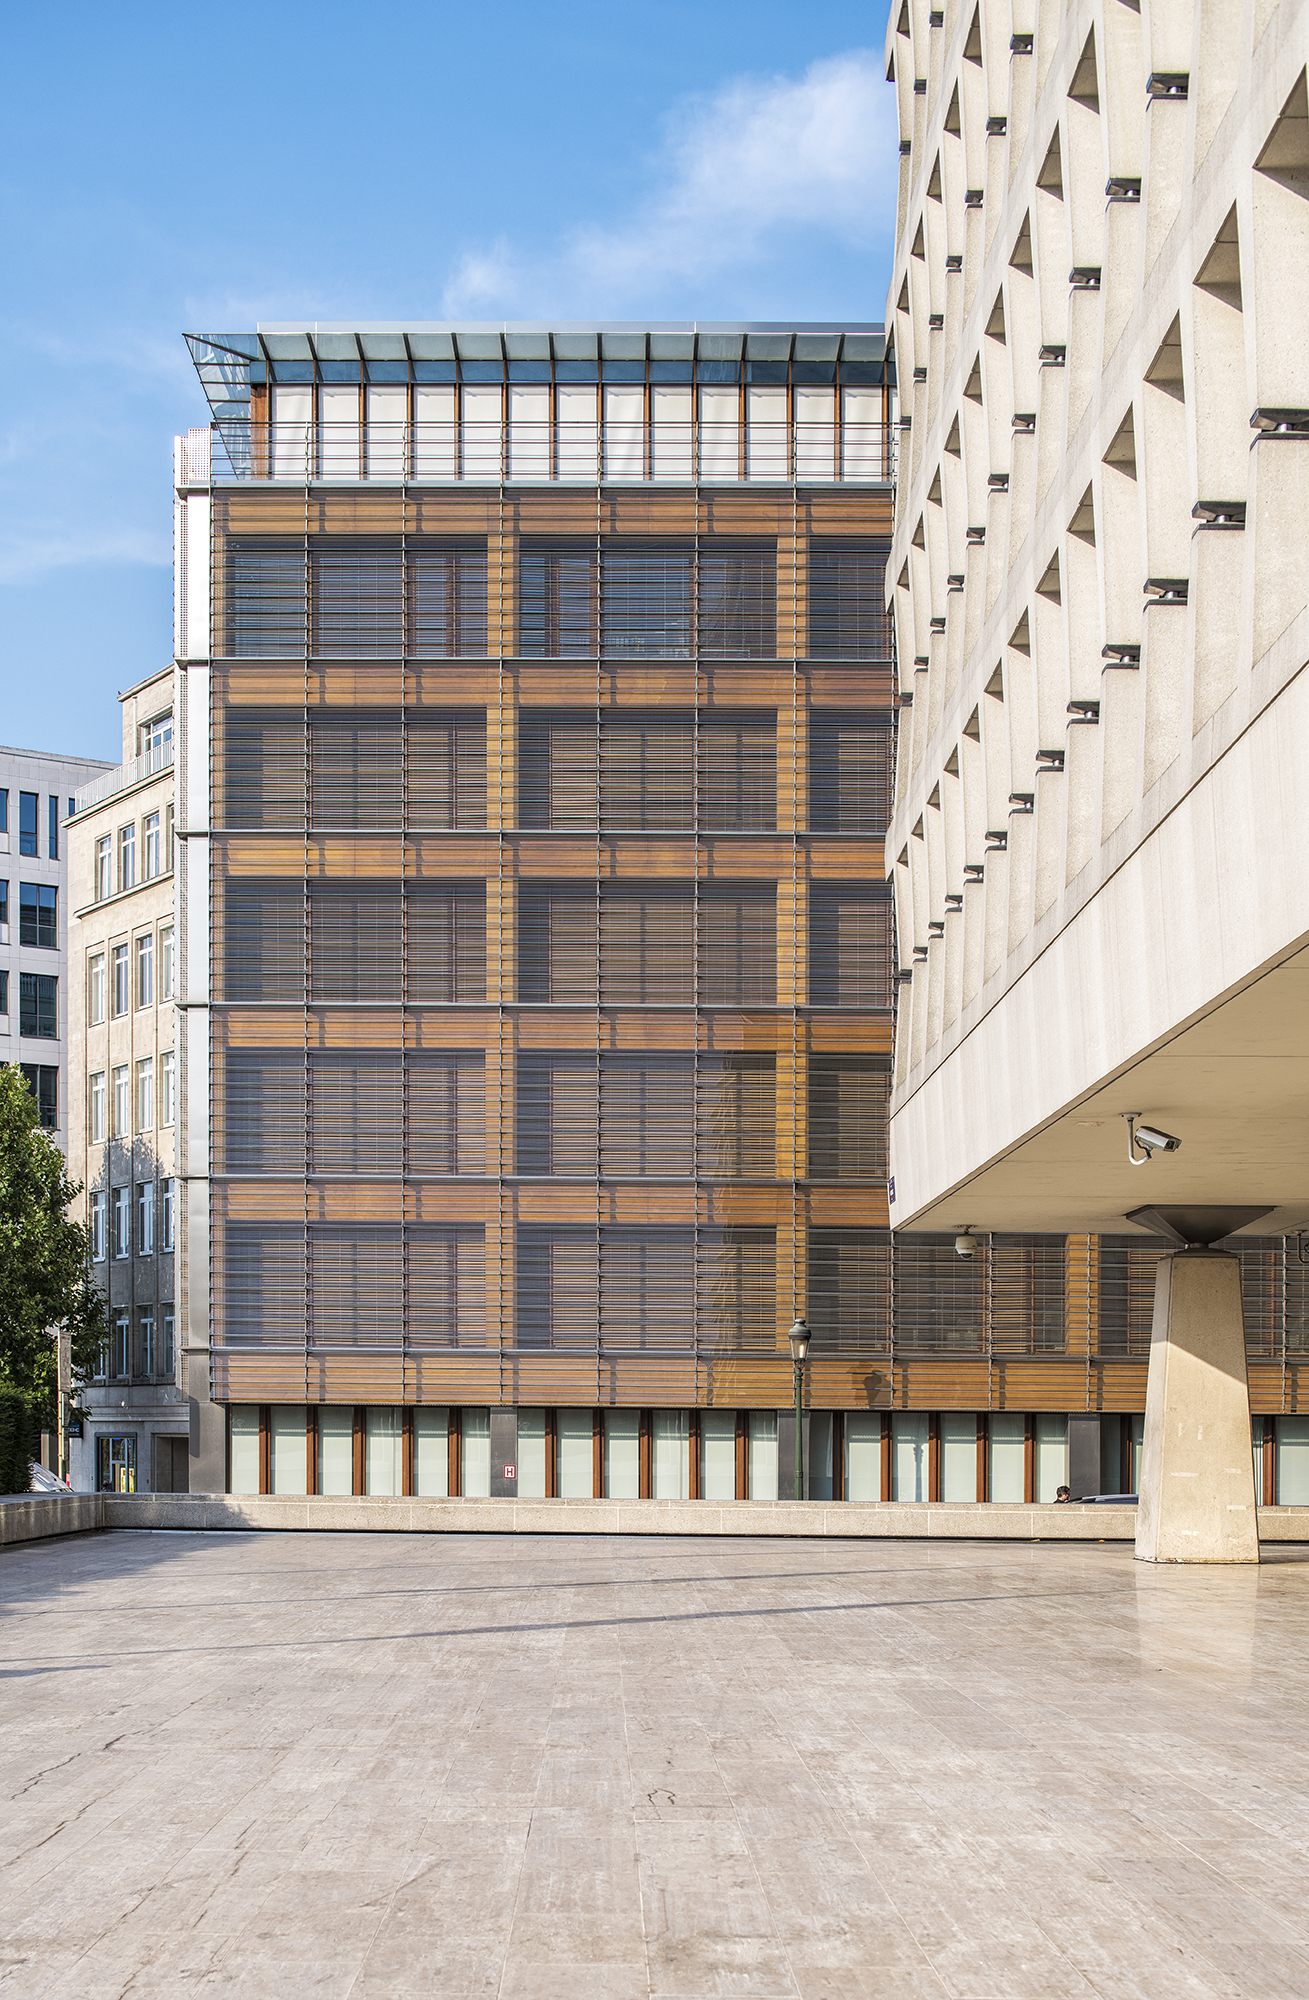 Half Open_Marnix Building (01_489) © Tim Fisher 2018 007.jpg